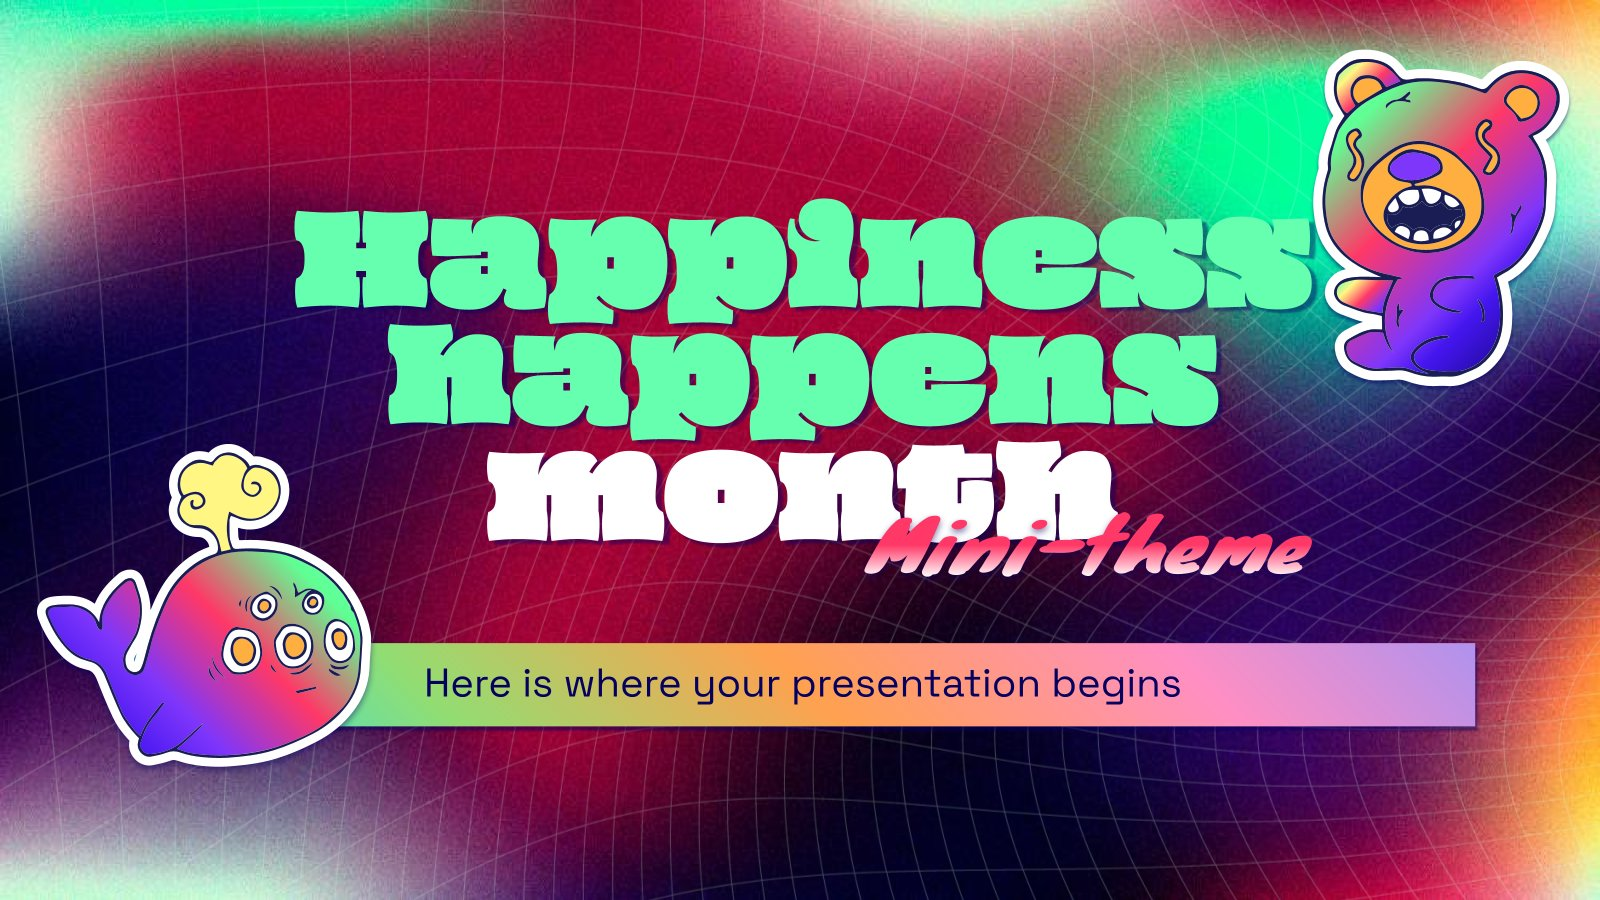 Happiness Happens Month Minitheme presentation template